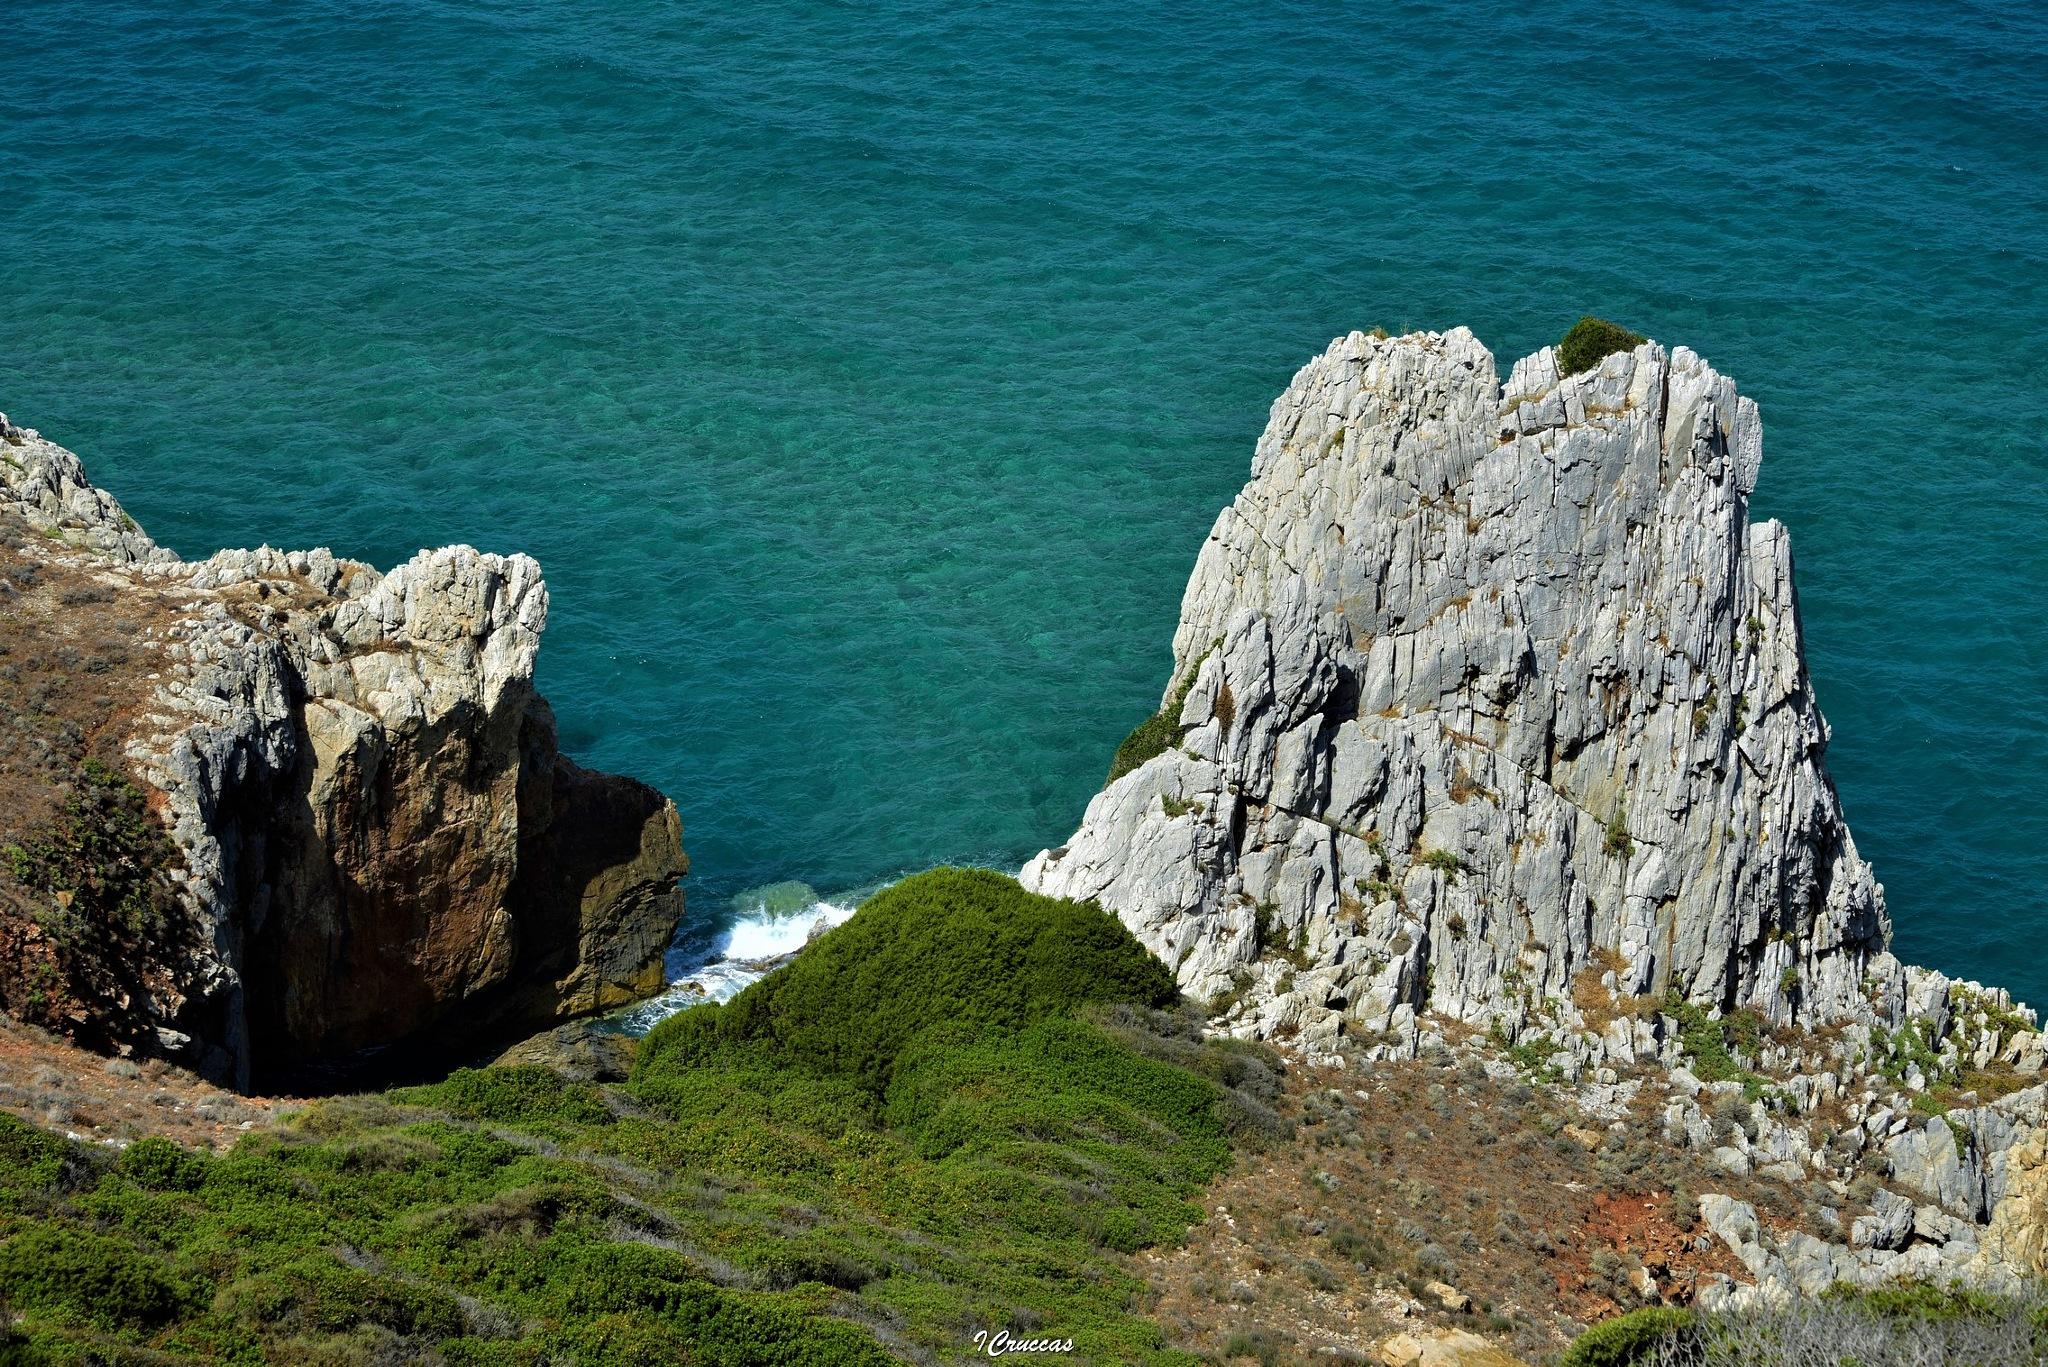 Peak on the sea by ignazio cruccas